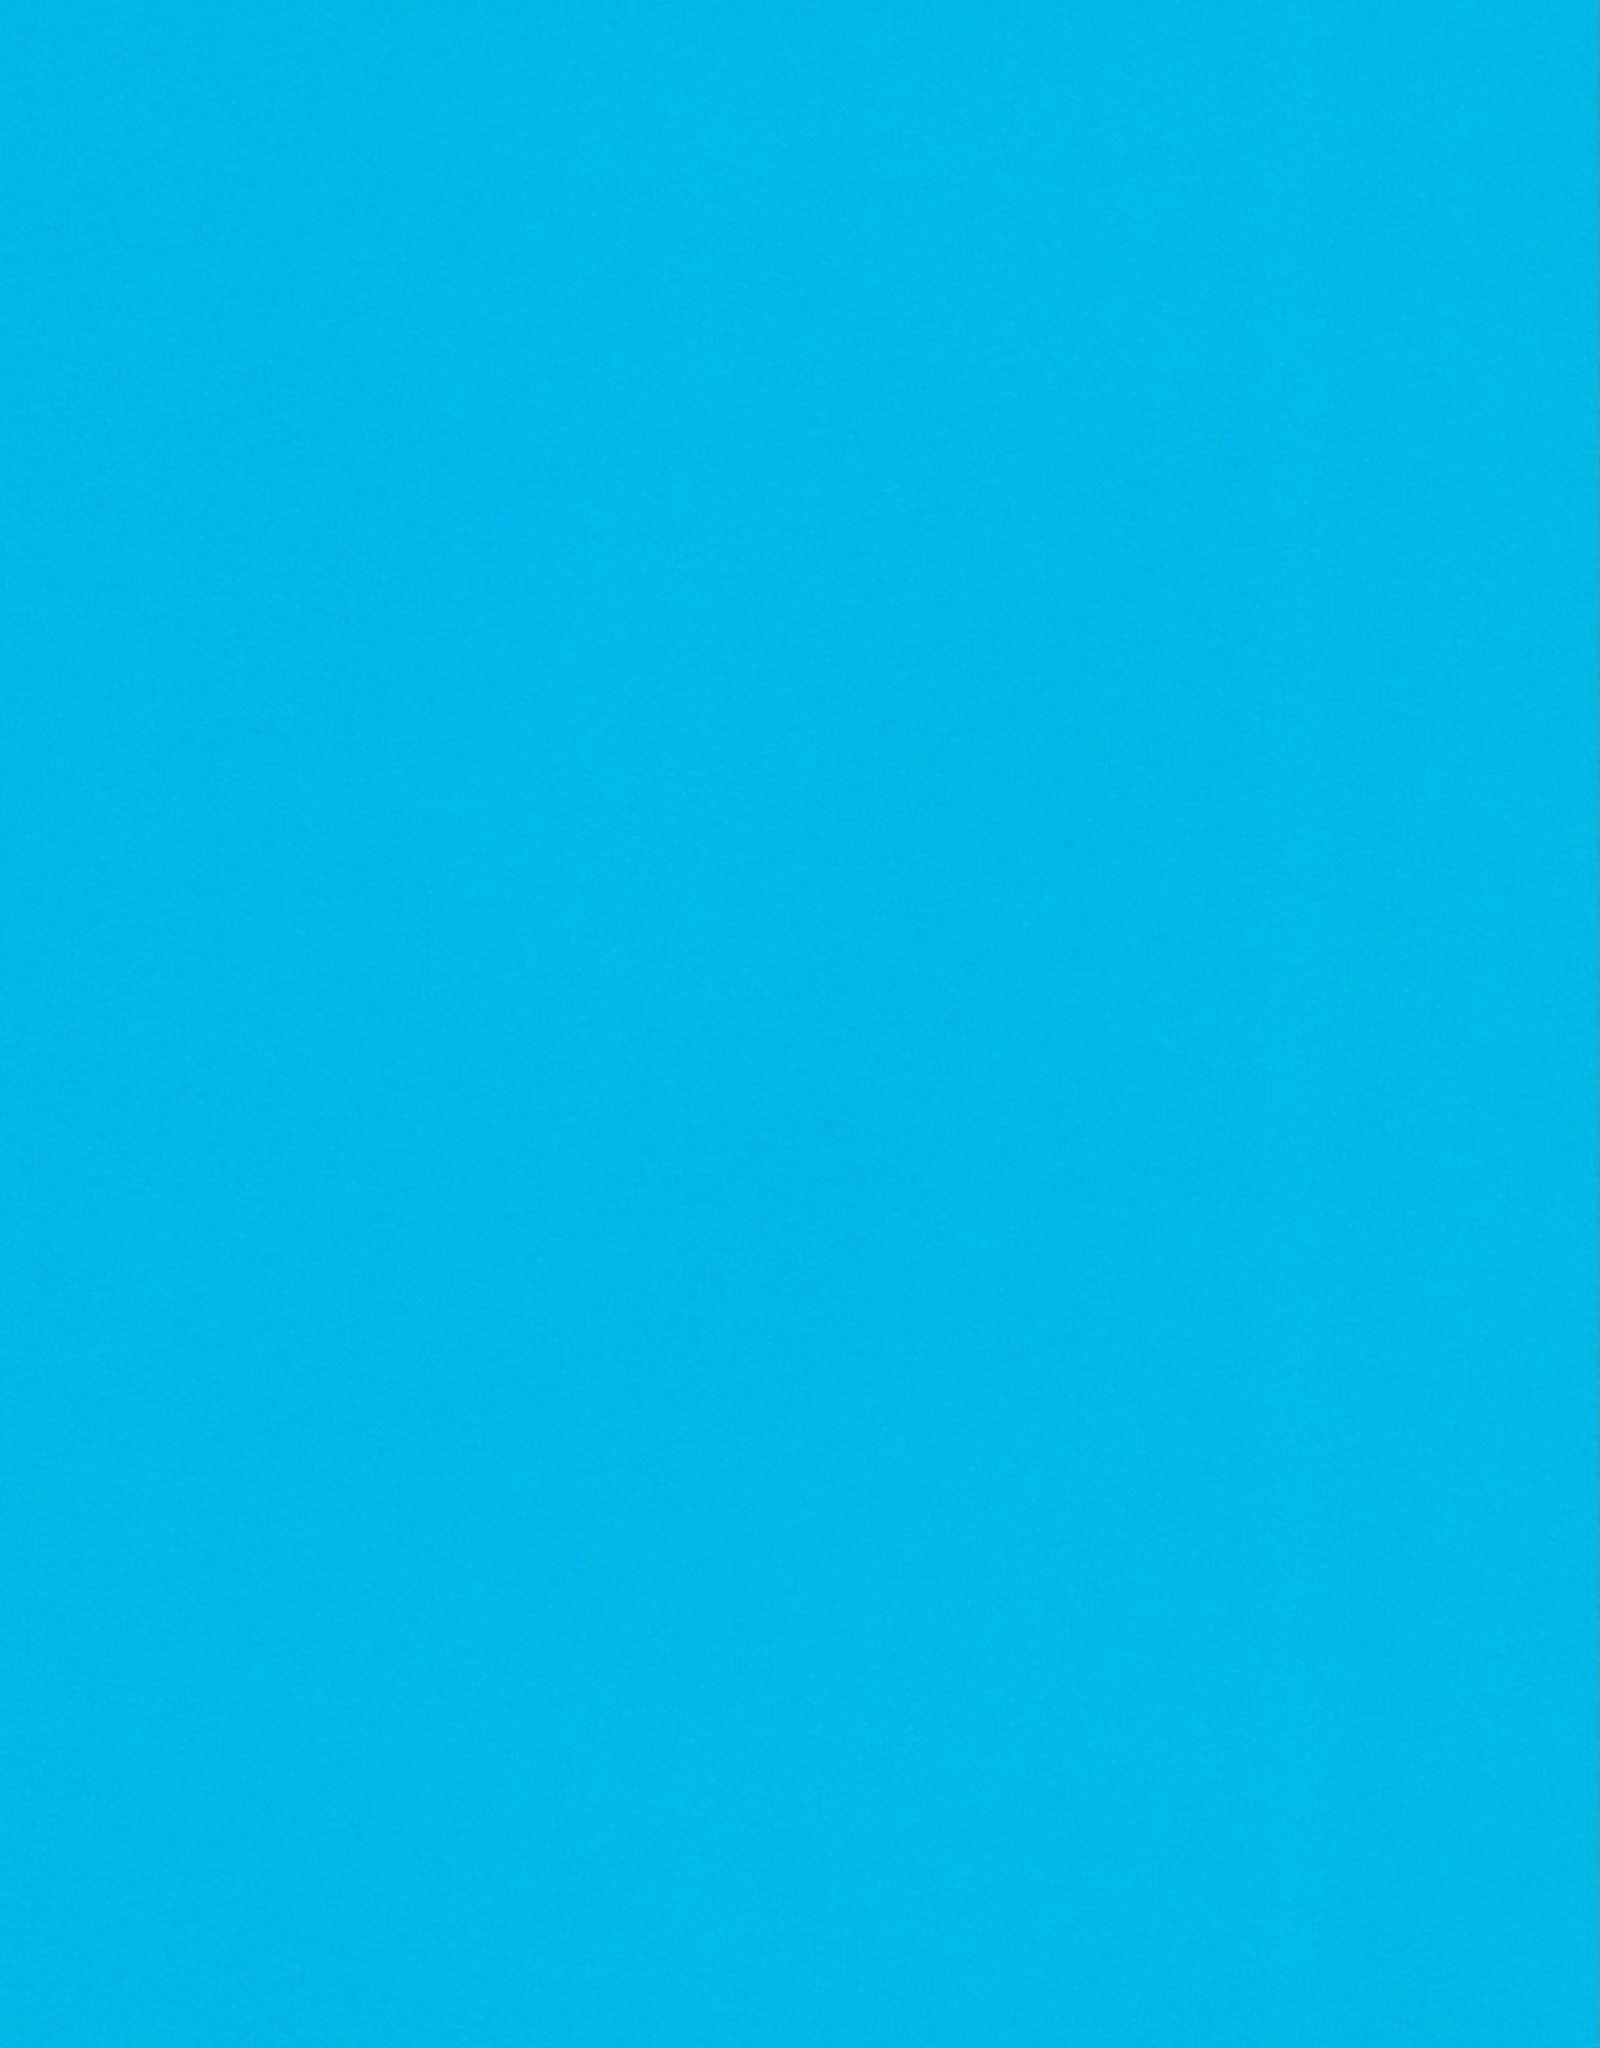 "Fabriano Vice Versa (Elle Erre), Sky Blue, 20"" x 27.5"", 220gsm / 135#"